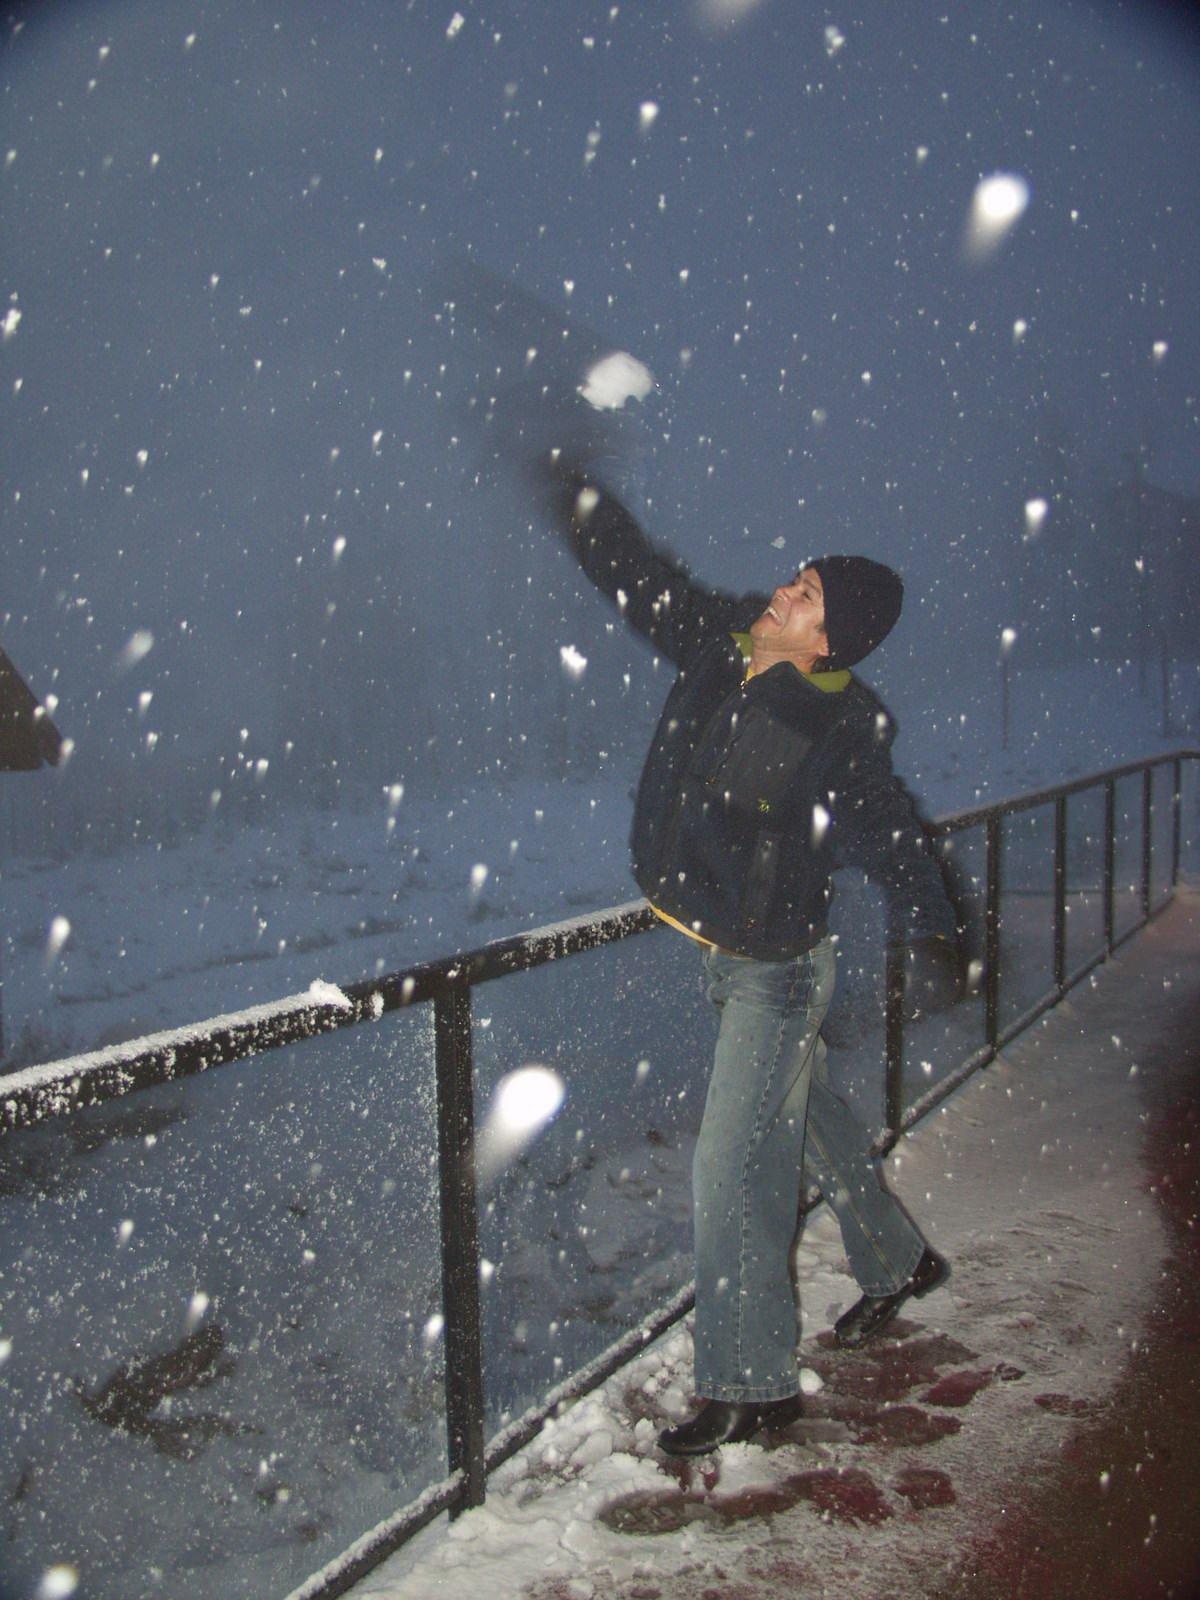 Everyone loves snow!